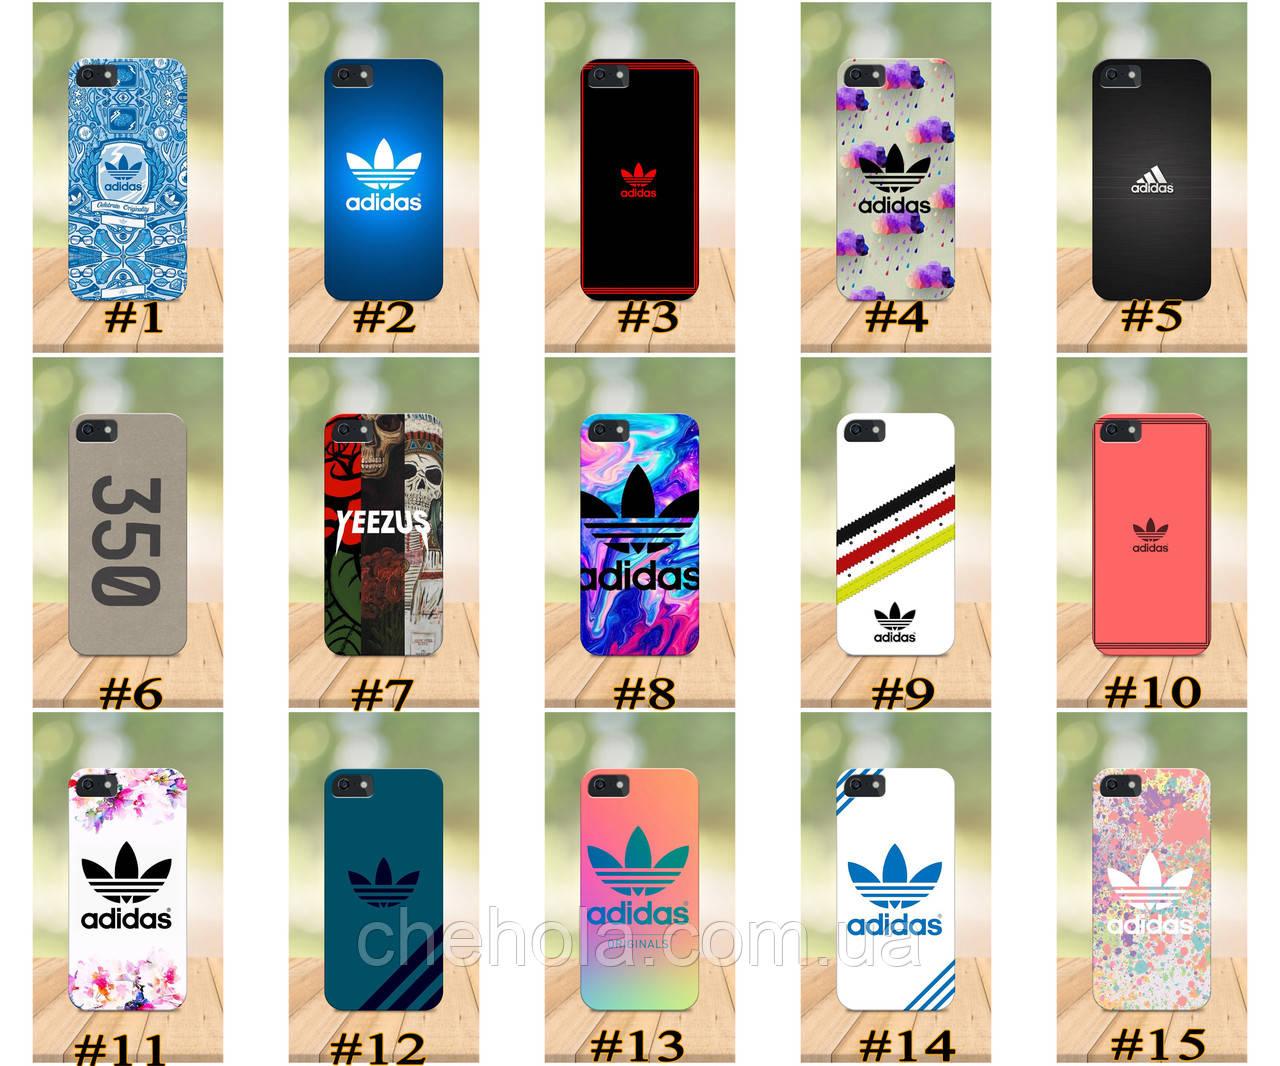 Чохол на iPhone 5 5s SE 4 4S бампер накладка з принтом в стилі Adidas Адідас